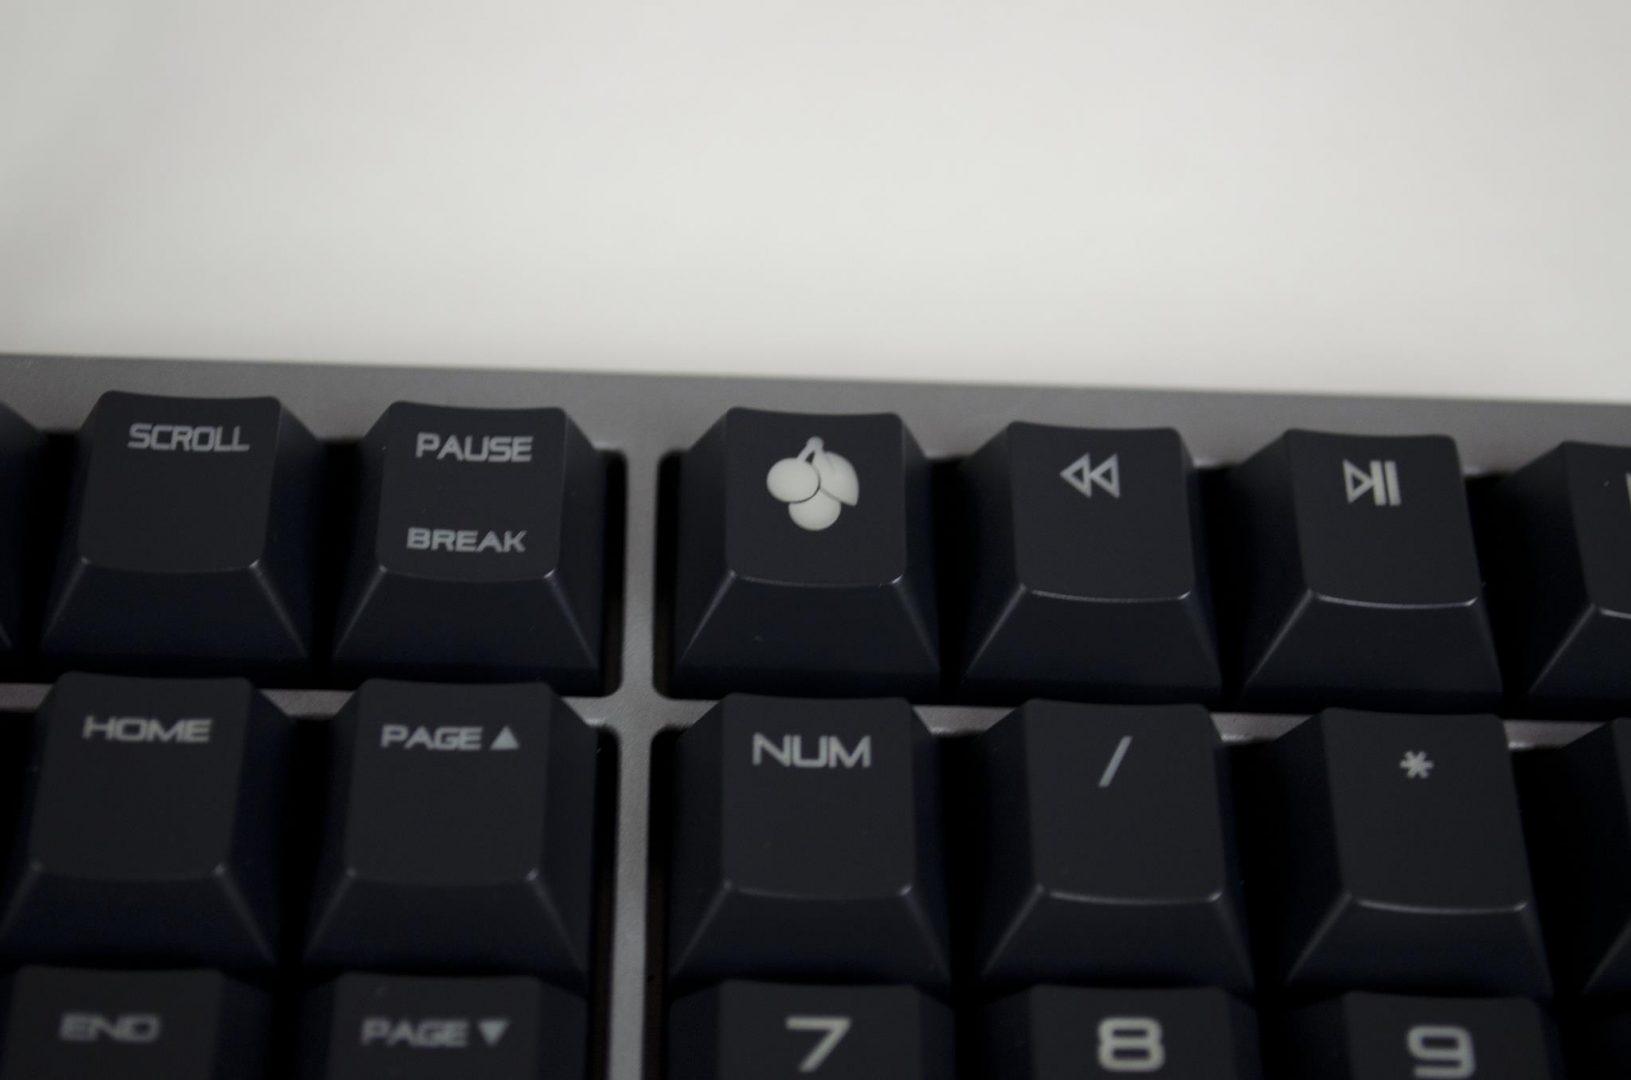 cherry mx-board 6 mechanical keyboard review_11